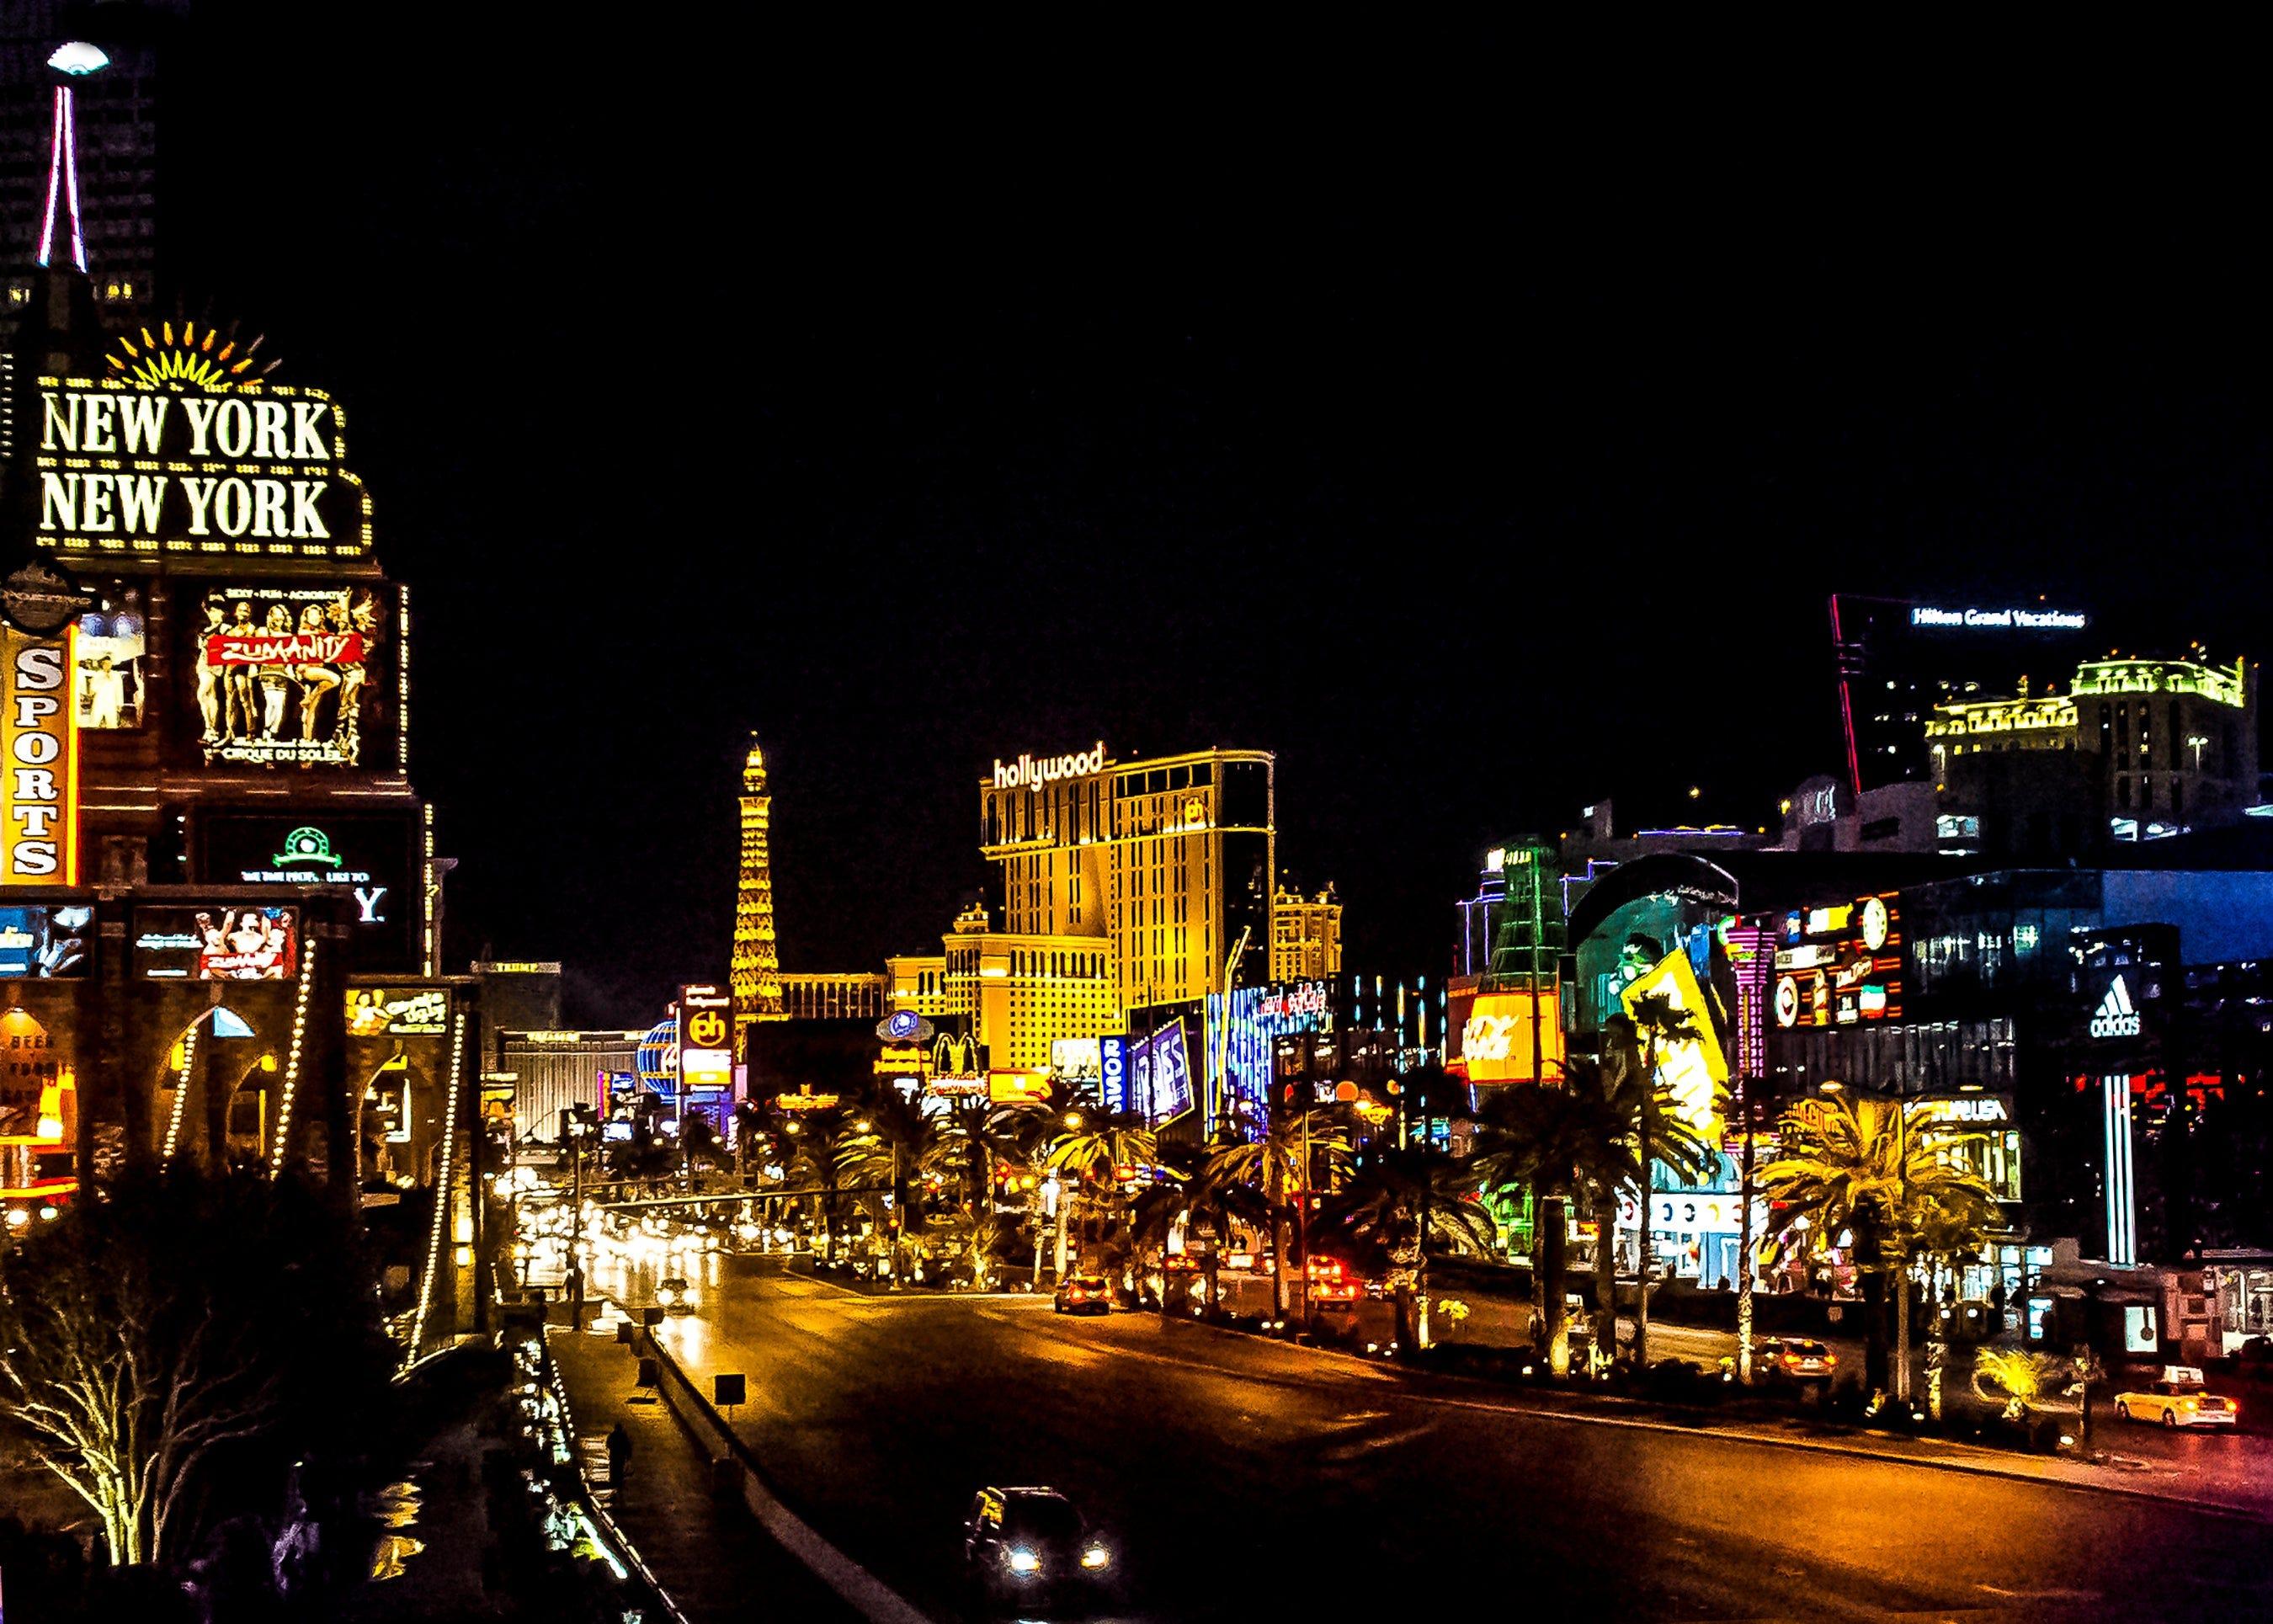 Station Casinos Resorts May Not Reopen Four Properties In Las Vegas